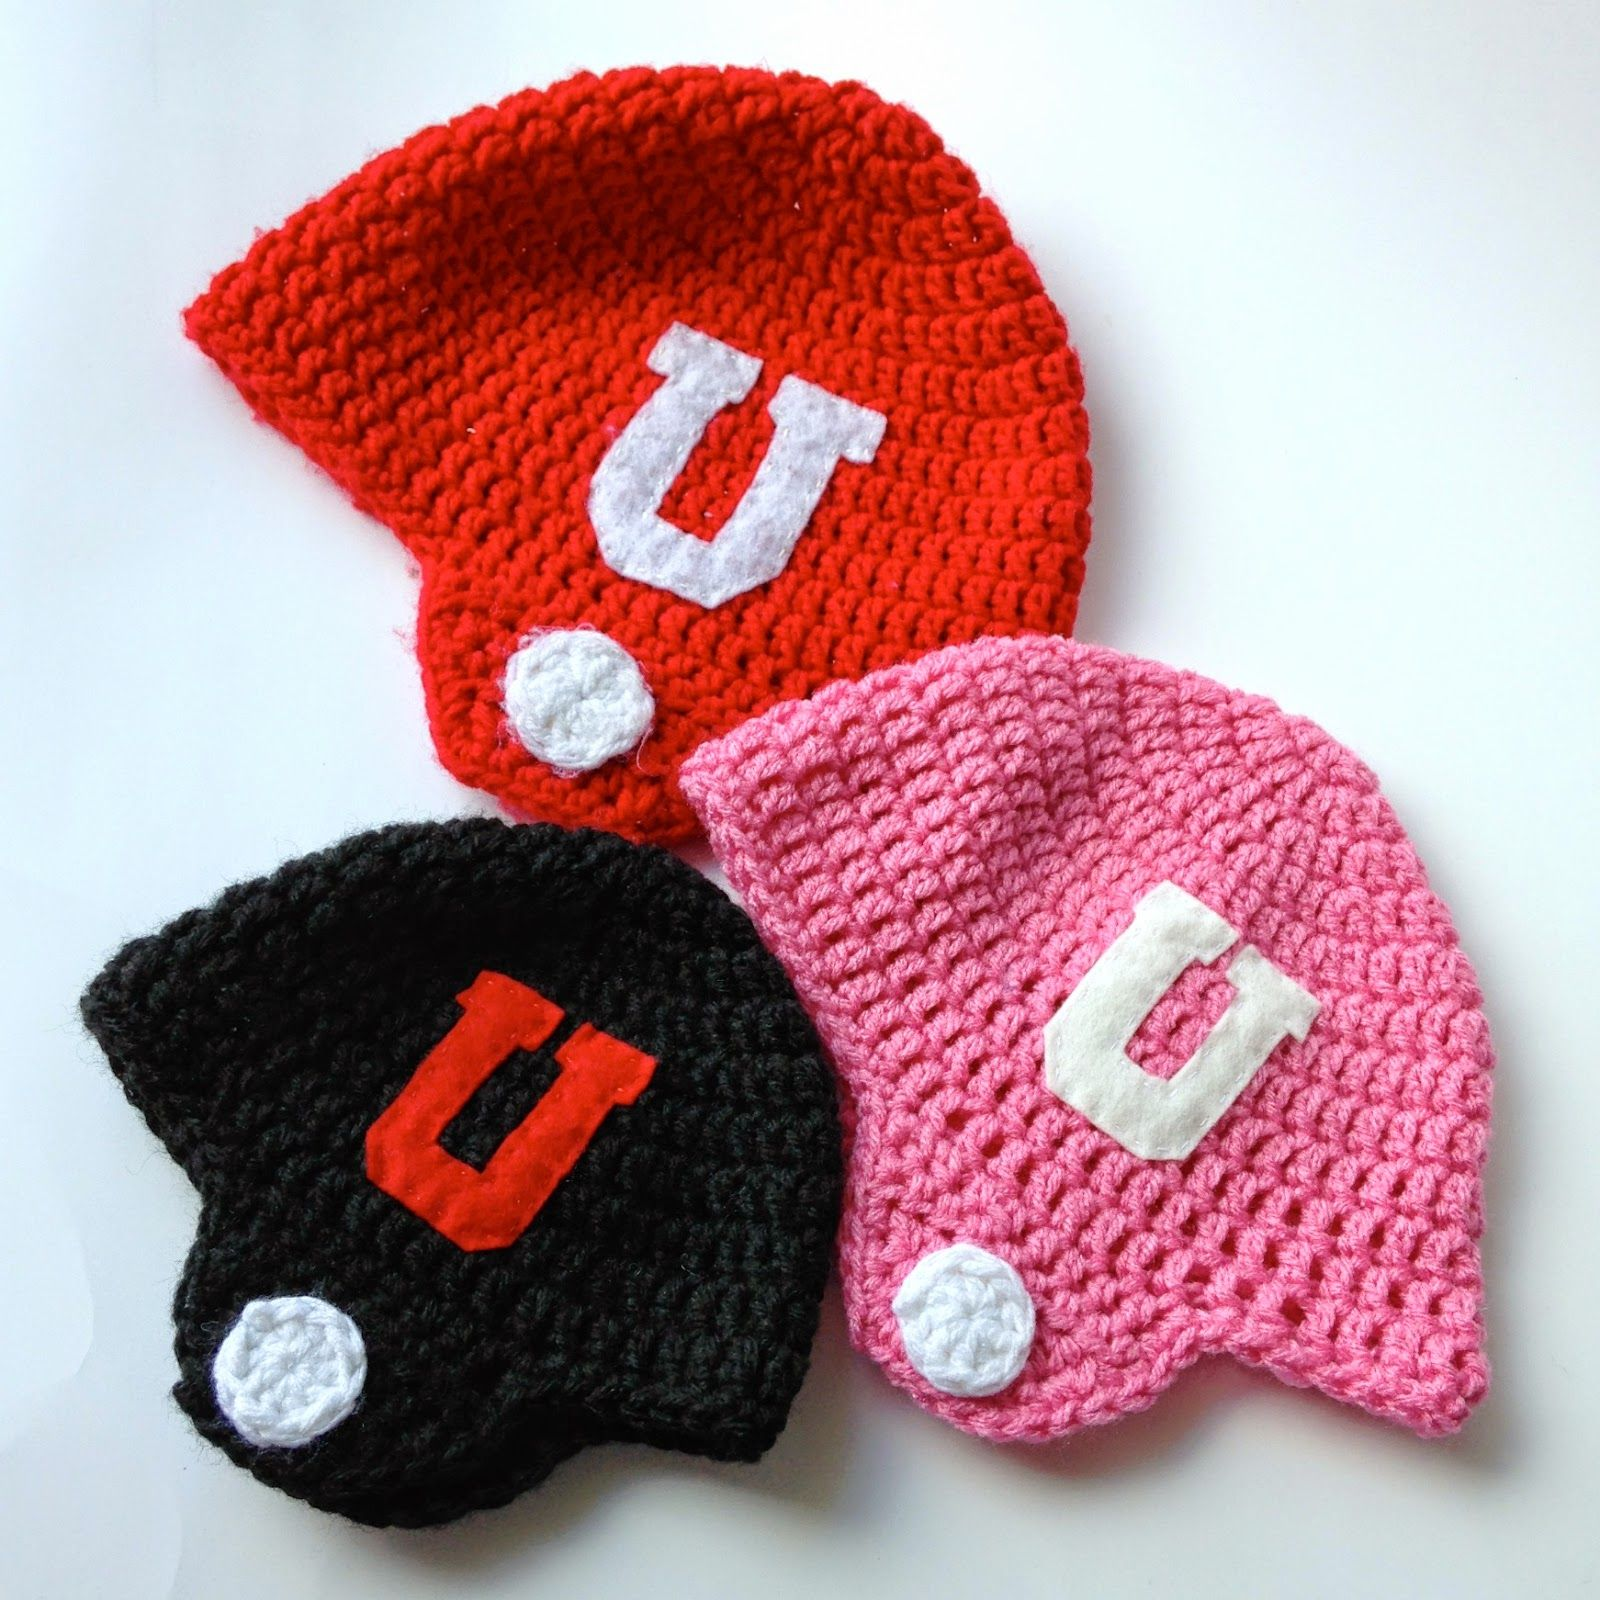 Free pattern for crocheted football helmet hats 6 sizes newborn free pattern for crocheted football helmet hats 6 sizes newborn child bankloansurffo Gallery